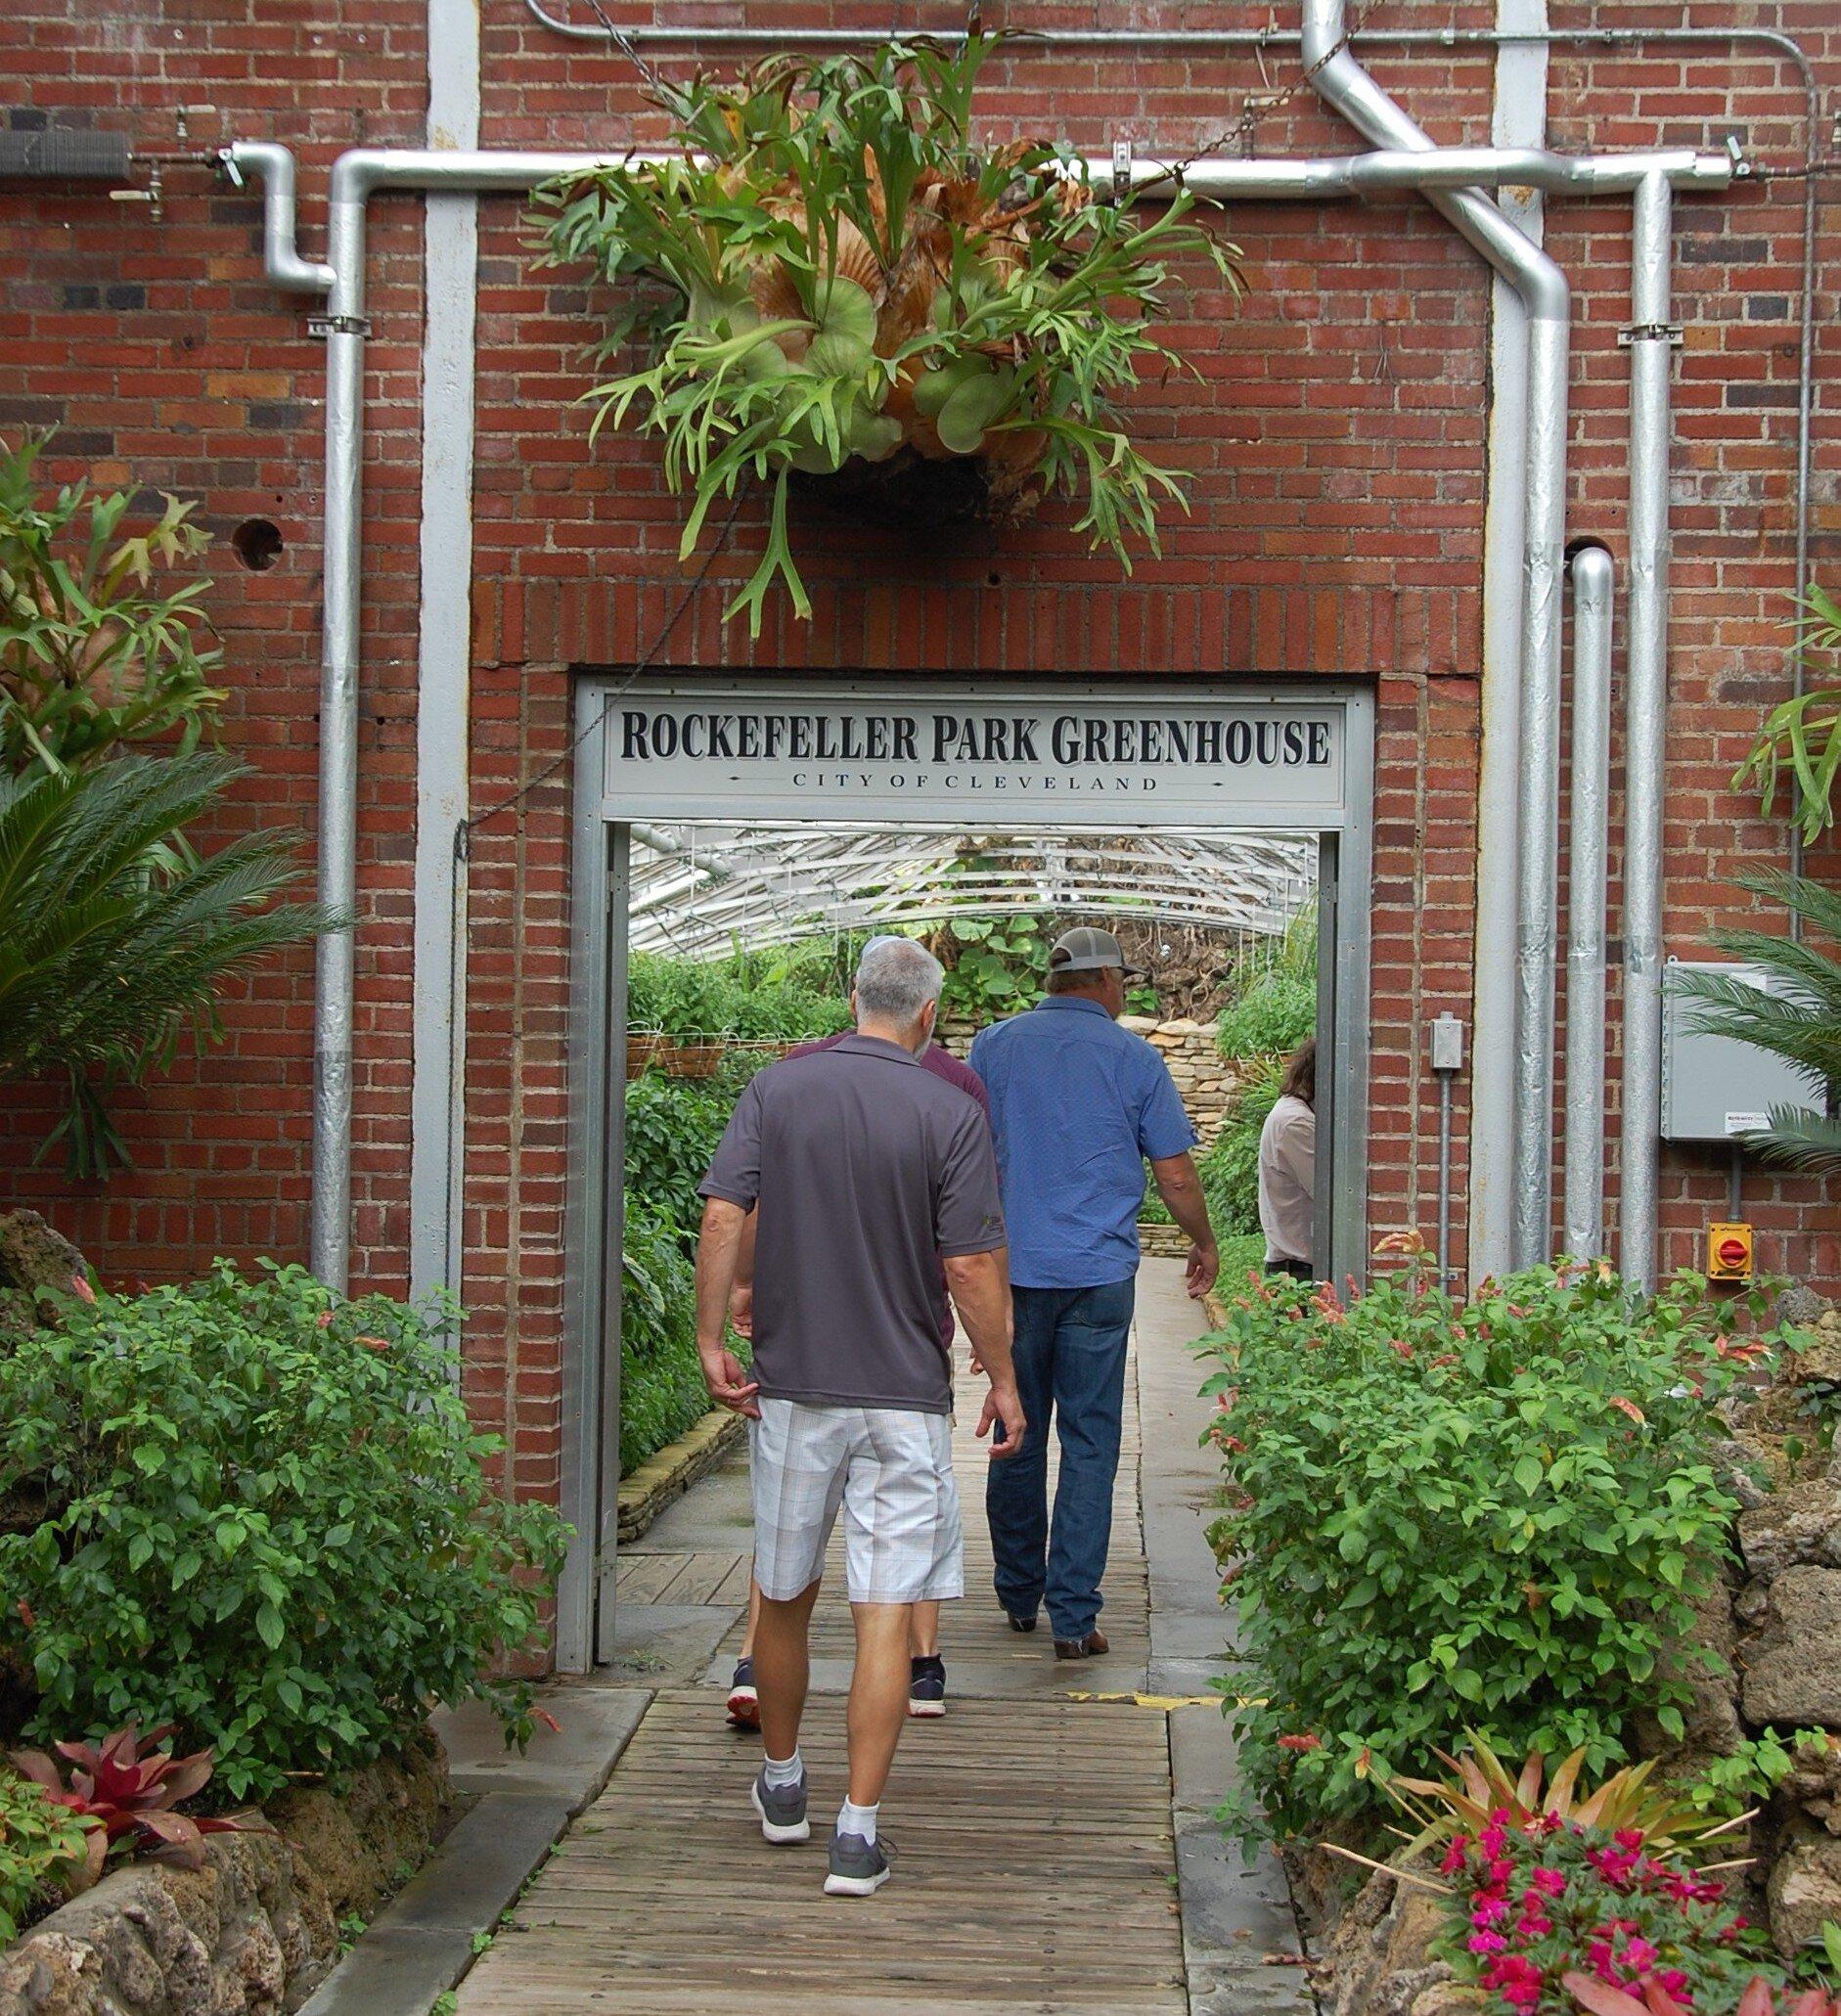 Rockefeller Greenhouse entrance copy.jpg